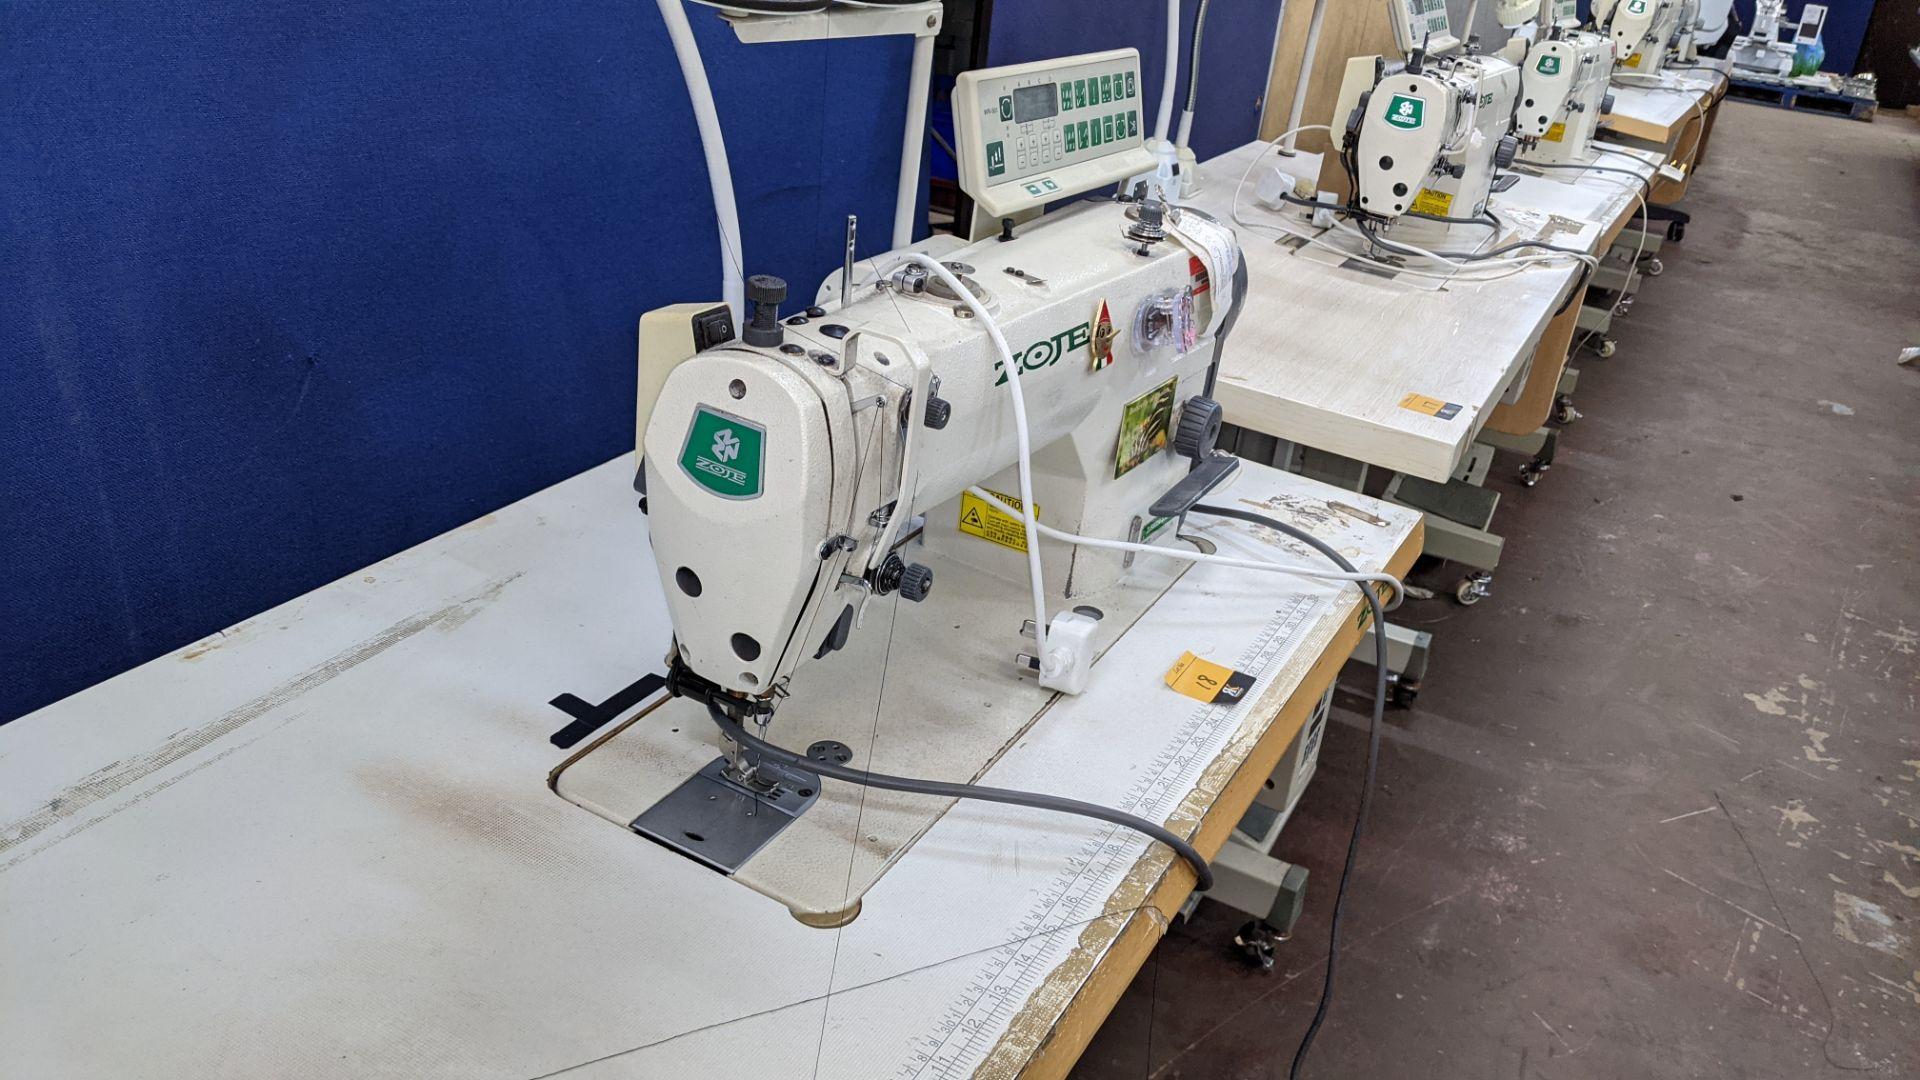 Zoje model ZJ9800A-D3B/PF lockstitch sewing machine with model WR-501 digital controller - Image 8 of 20